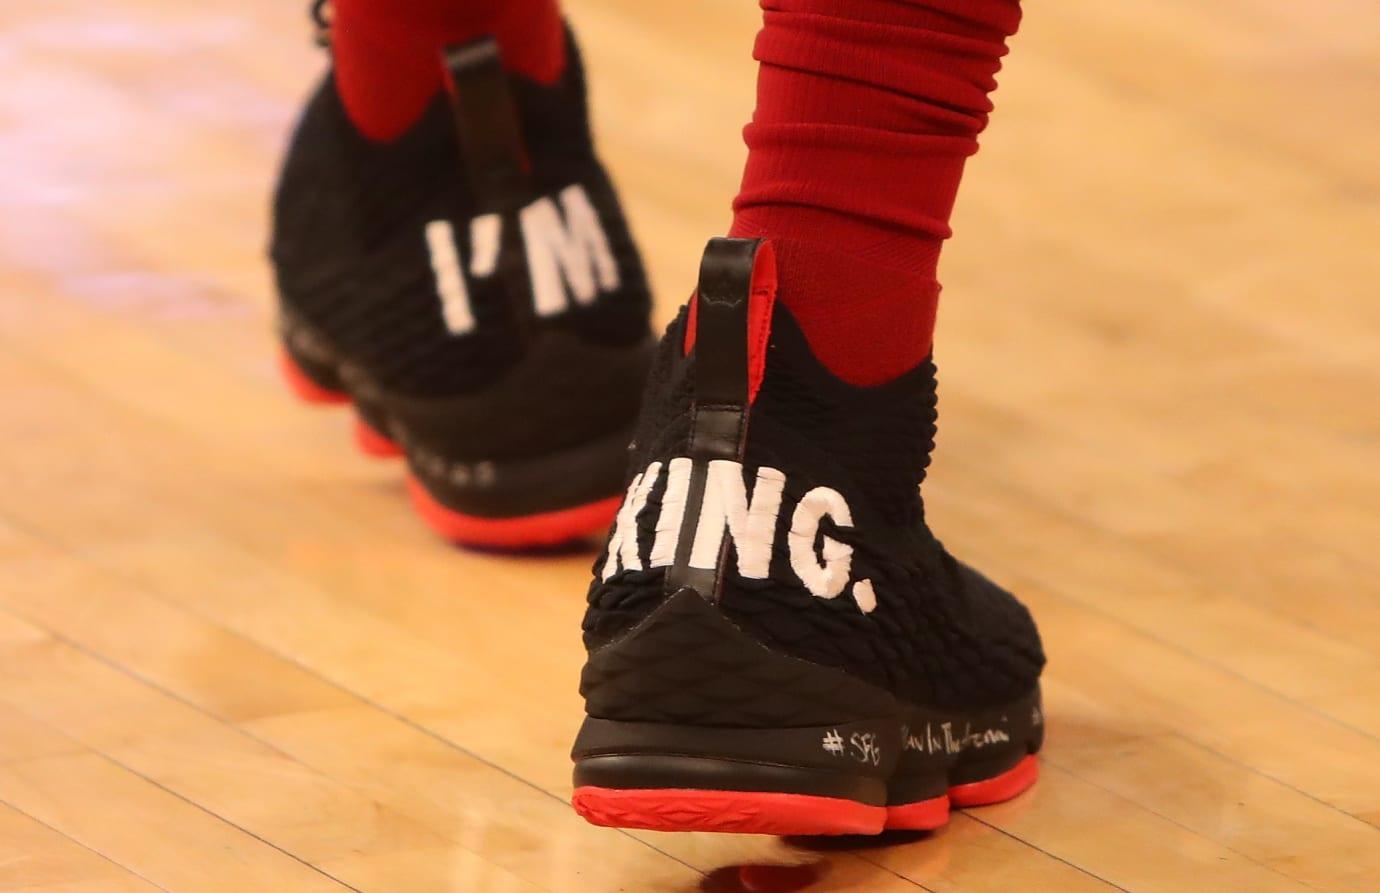 46c14dd2da43 LeBron James Debuts Nike LeBron 15  I m King  PE